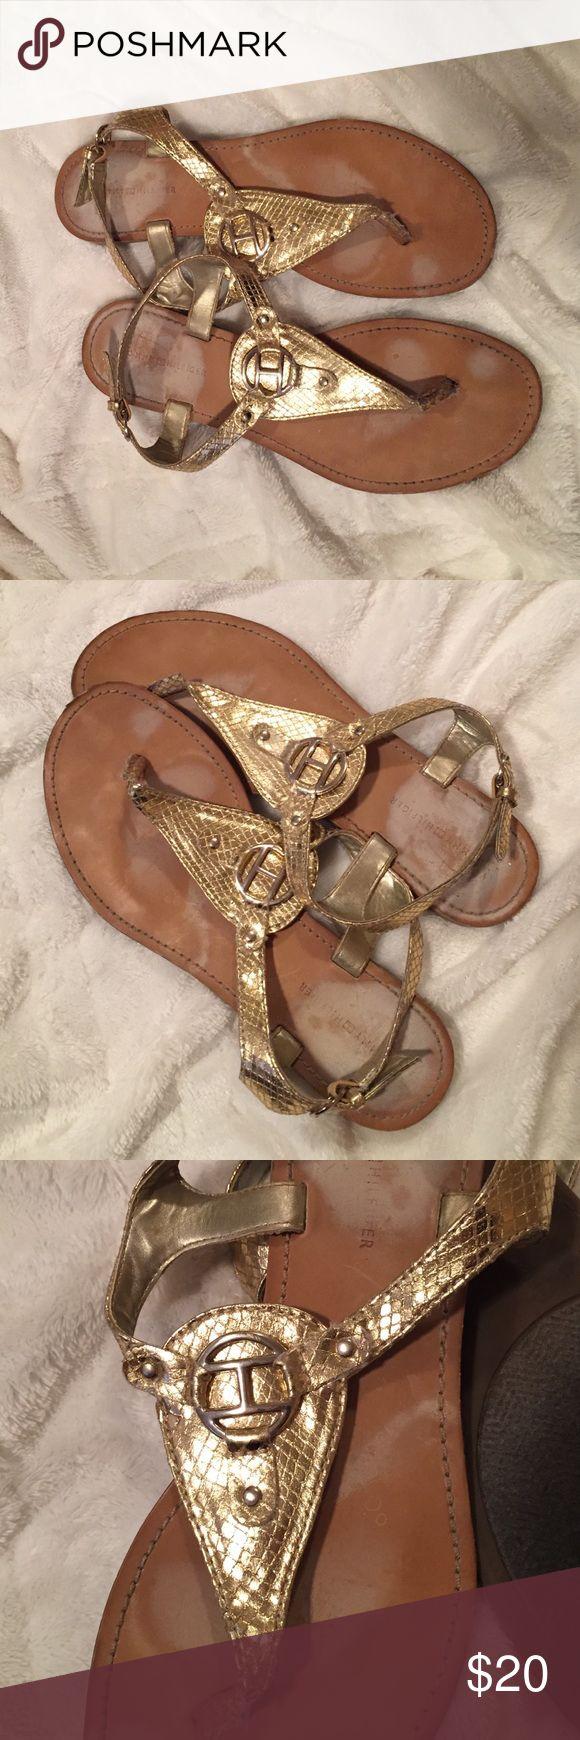 Tommy Hilfiger gold flat sandals Tommy Hilfiger 7.5 gold flat sandals Tommy Hilfiger Shoes Sandals